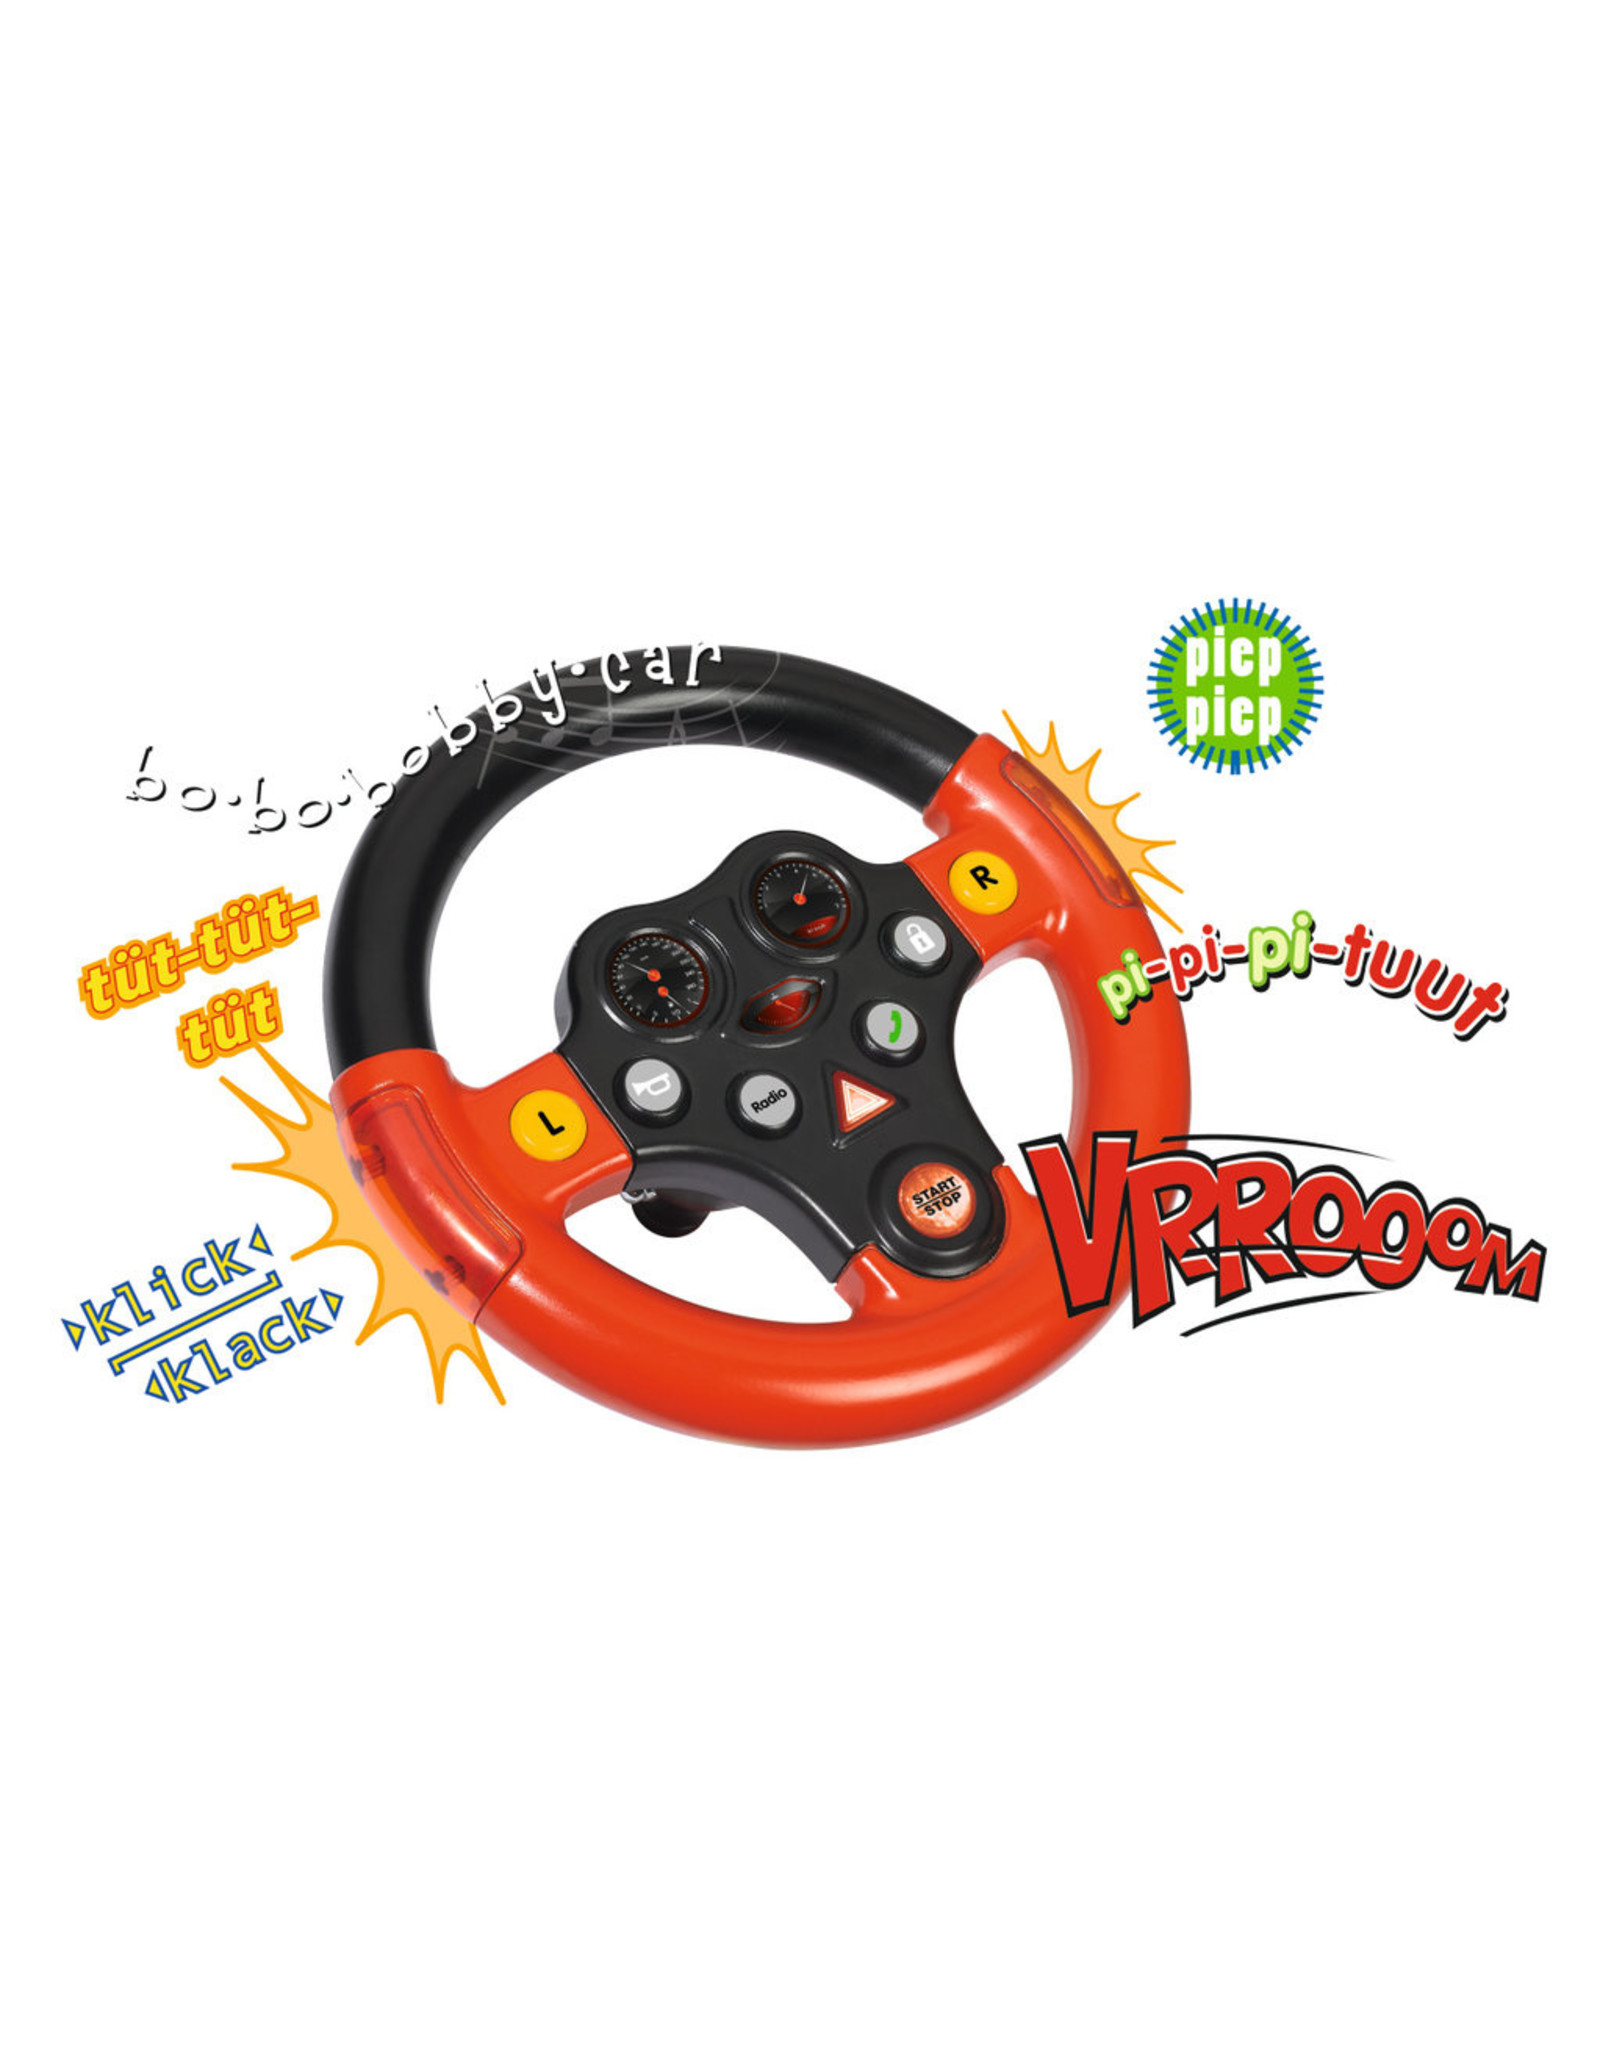 BIG BIG Multi Sound Wheel